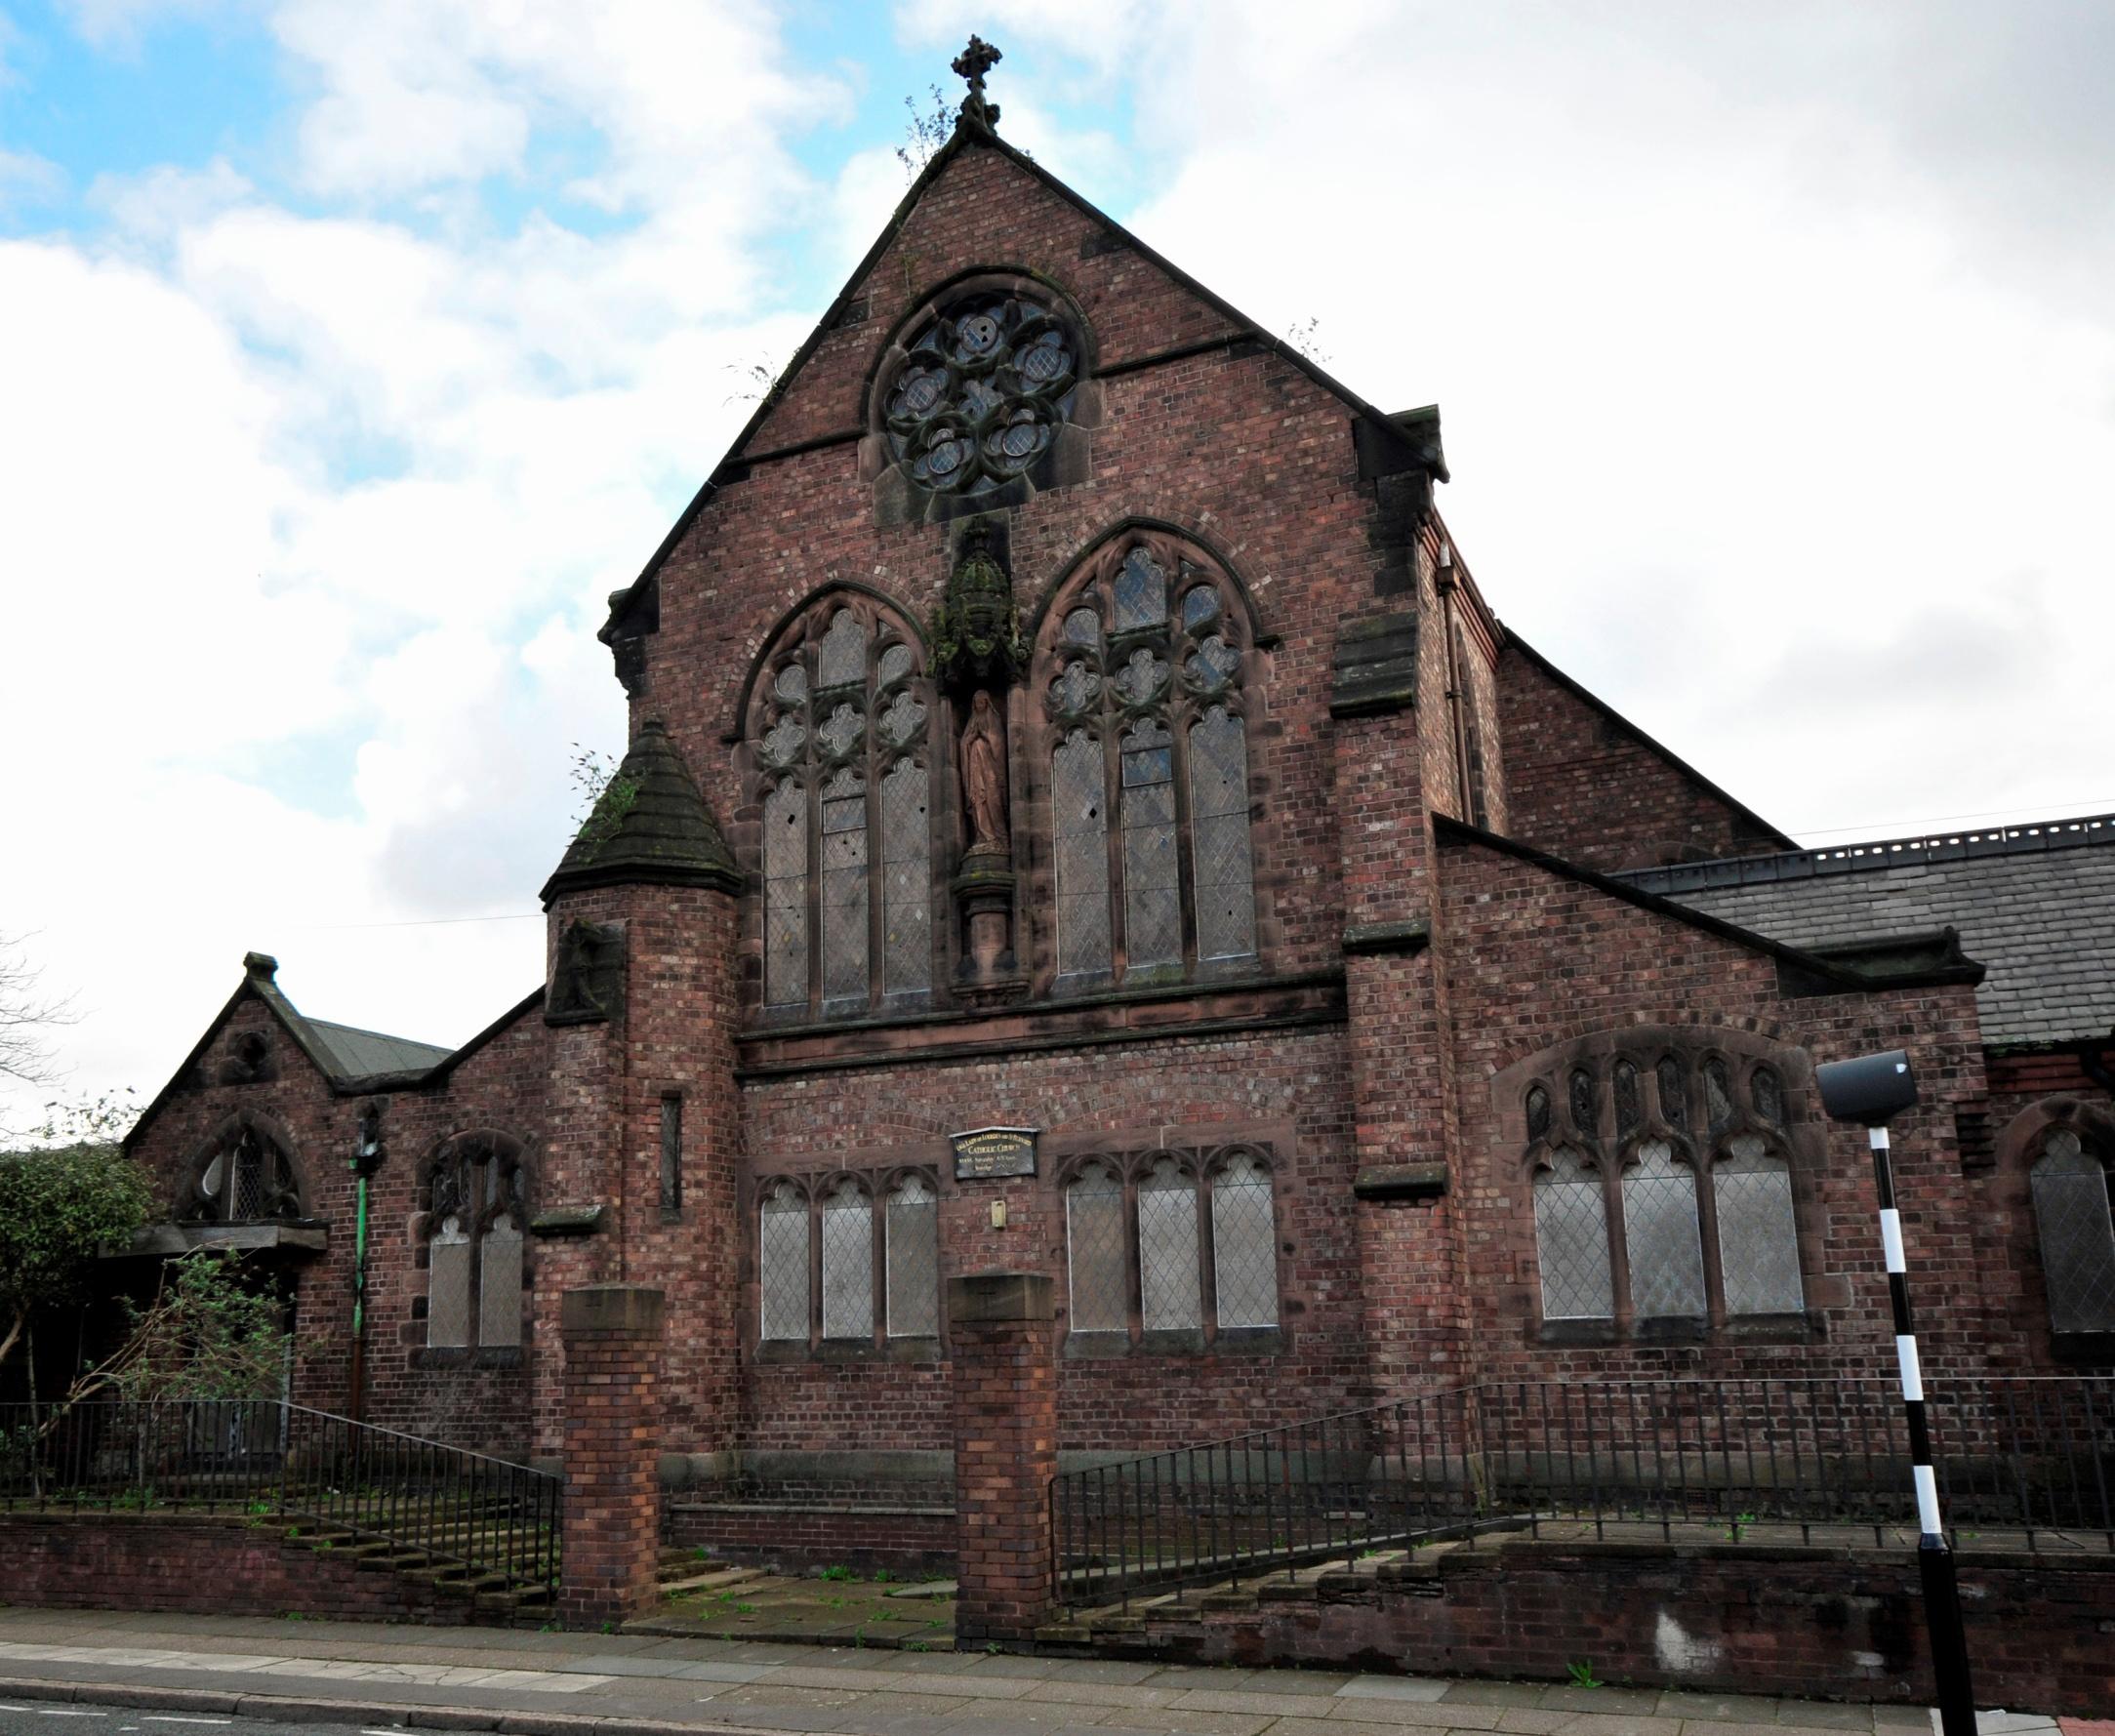 The disused St Bernard's Church on Kingsley Road